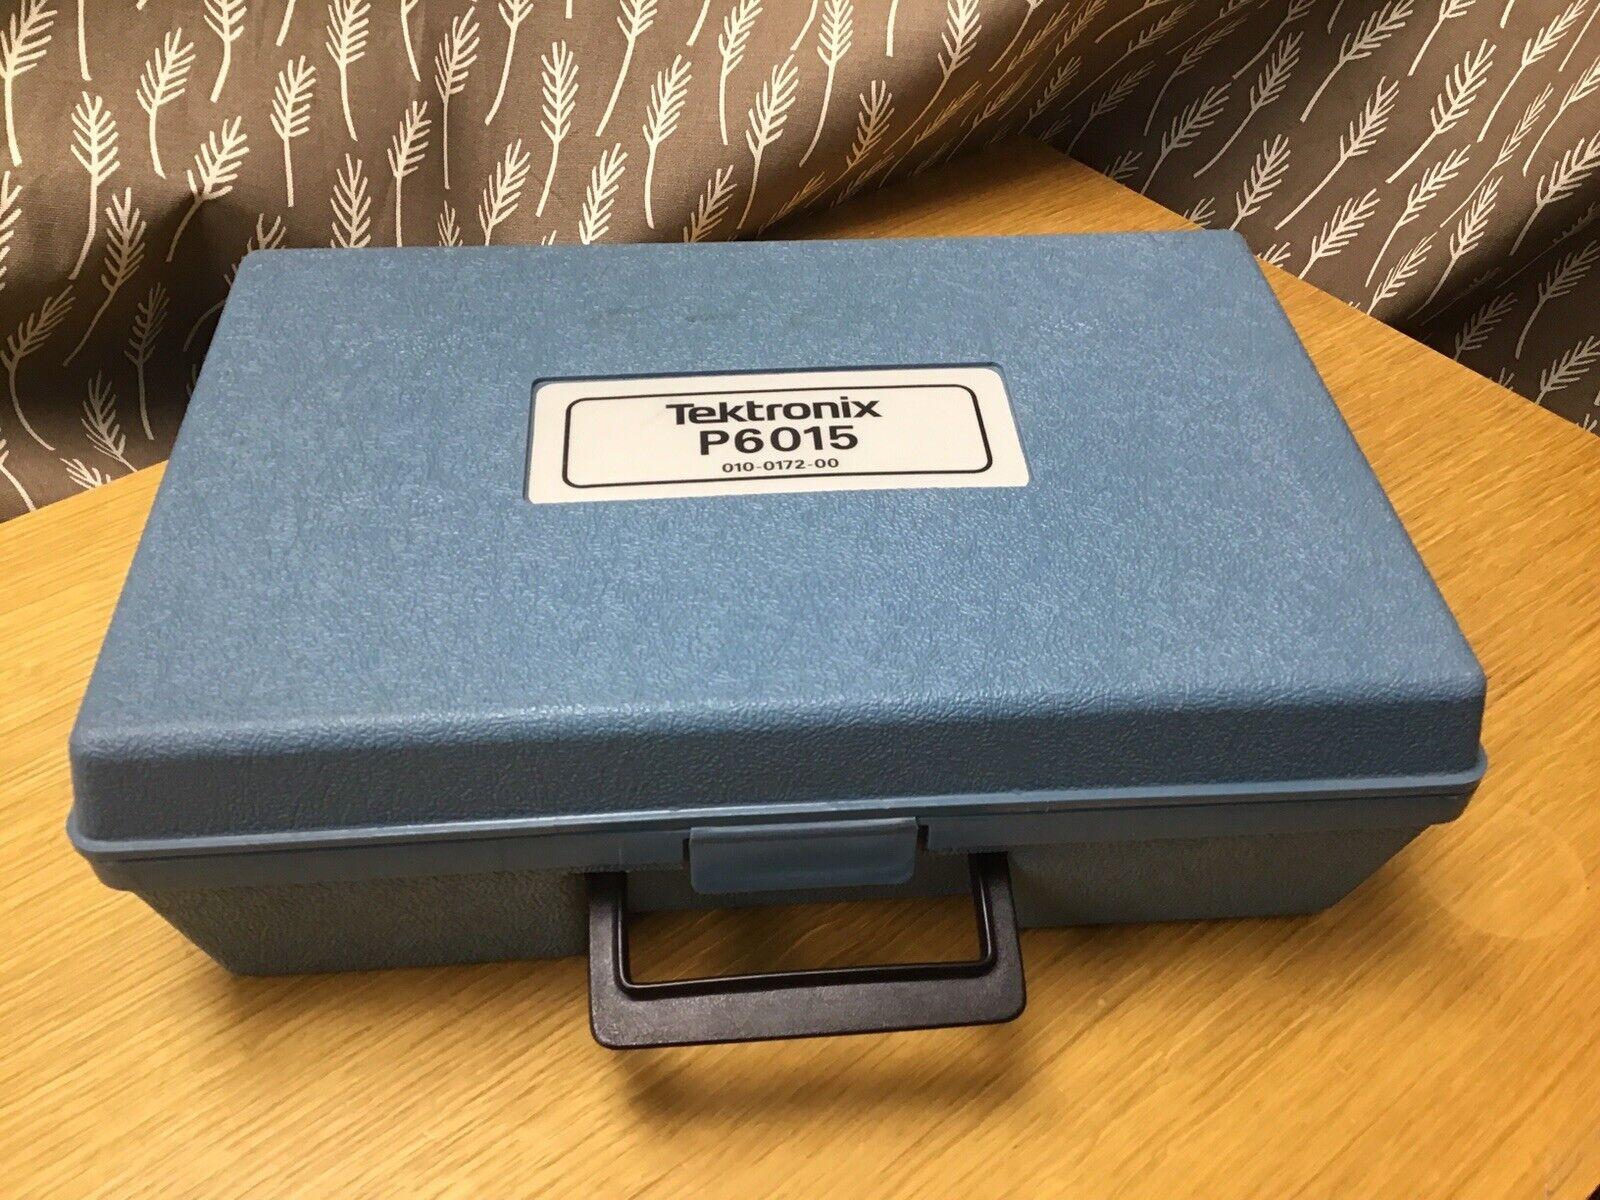 Tektronix P6009 High Voltage Probe 120 MHz 100x for sale online